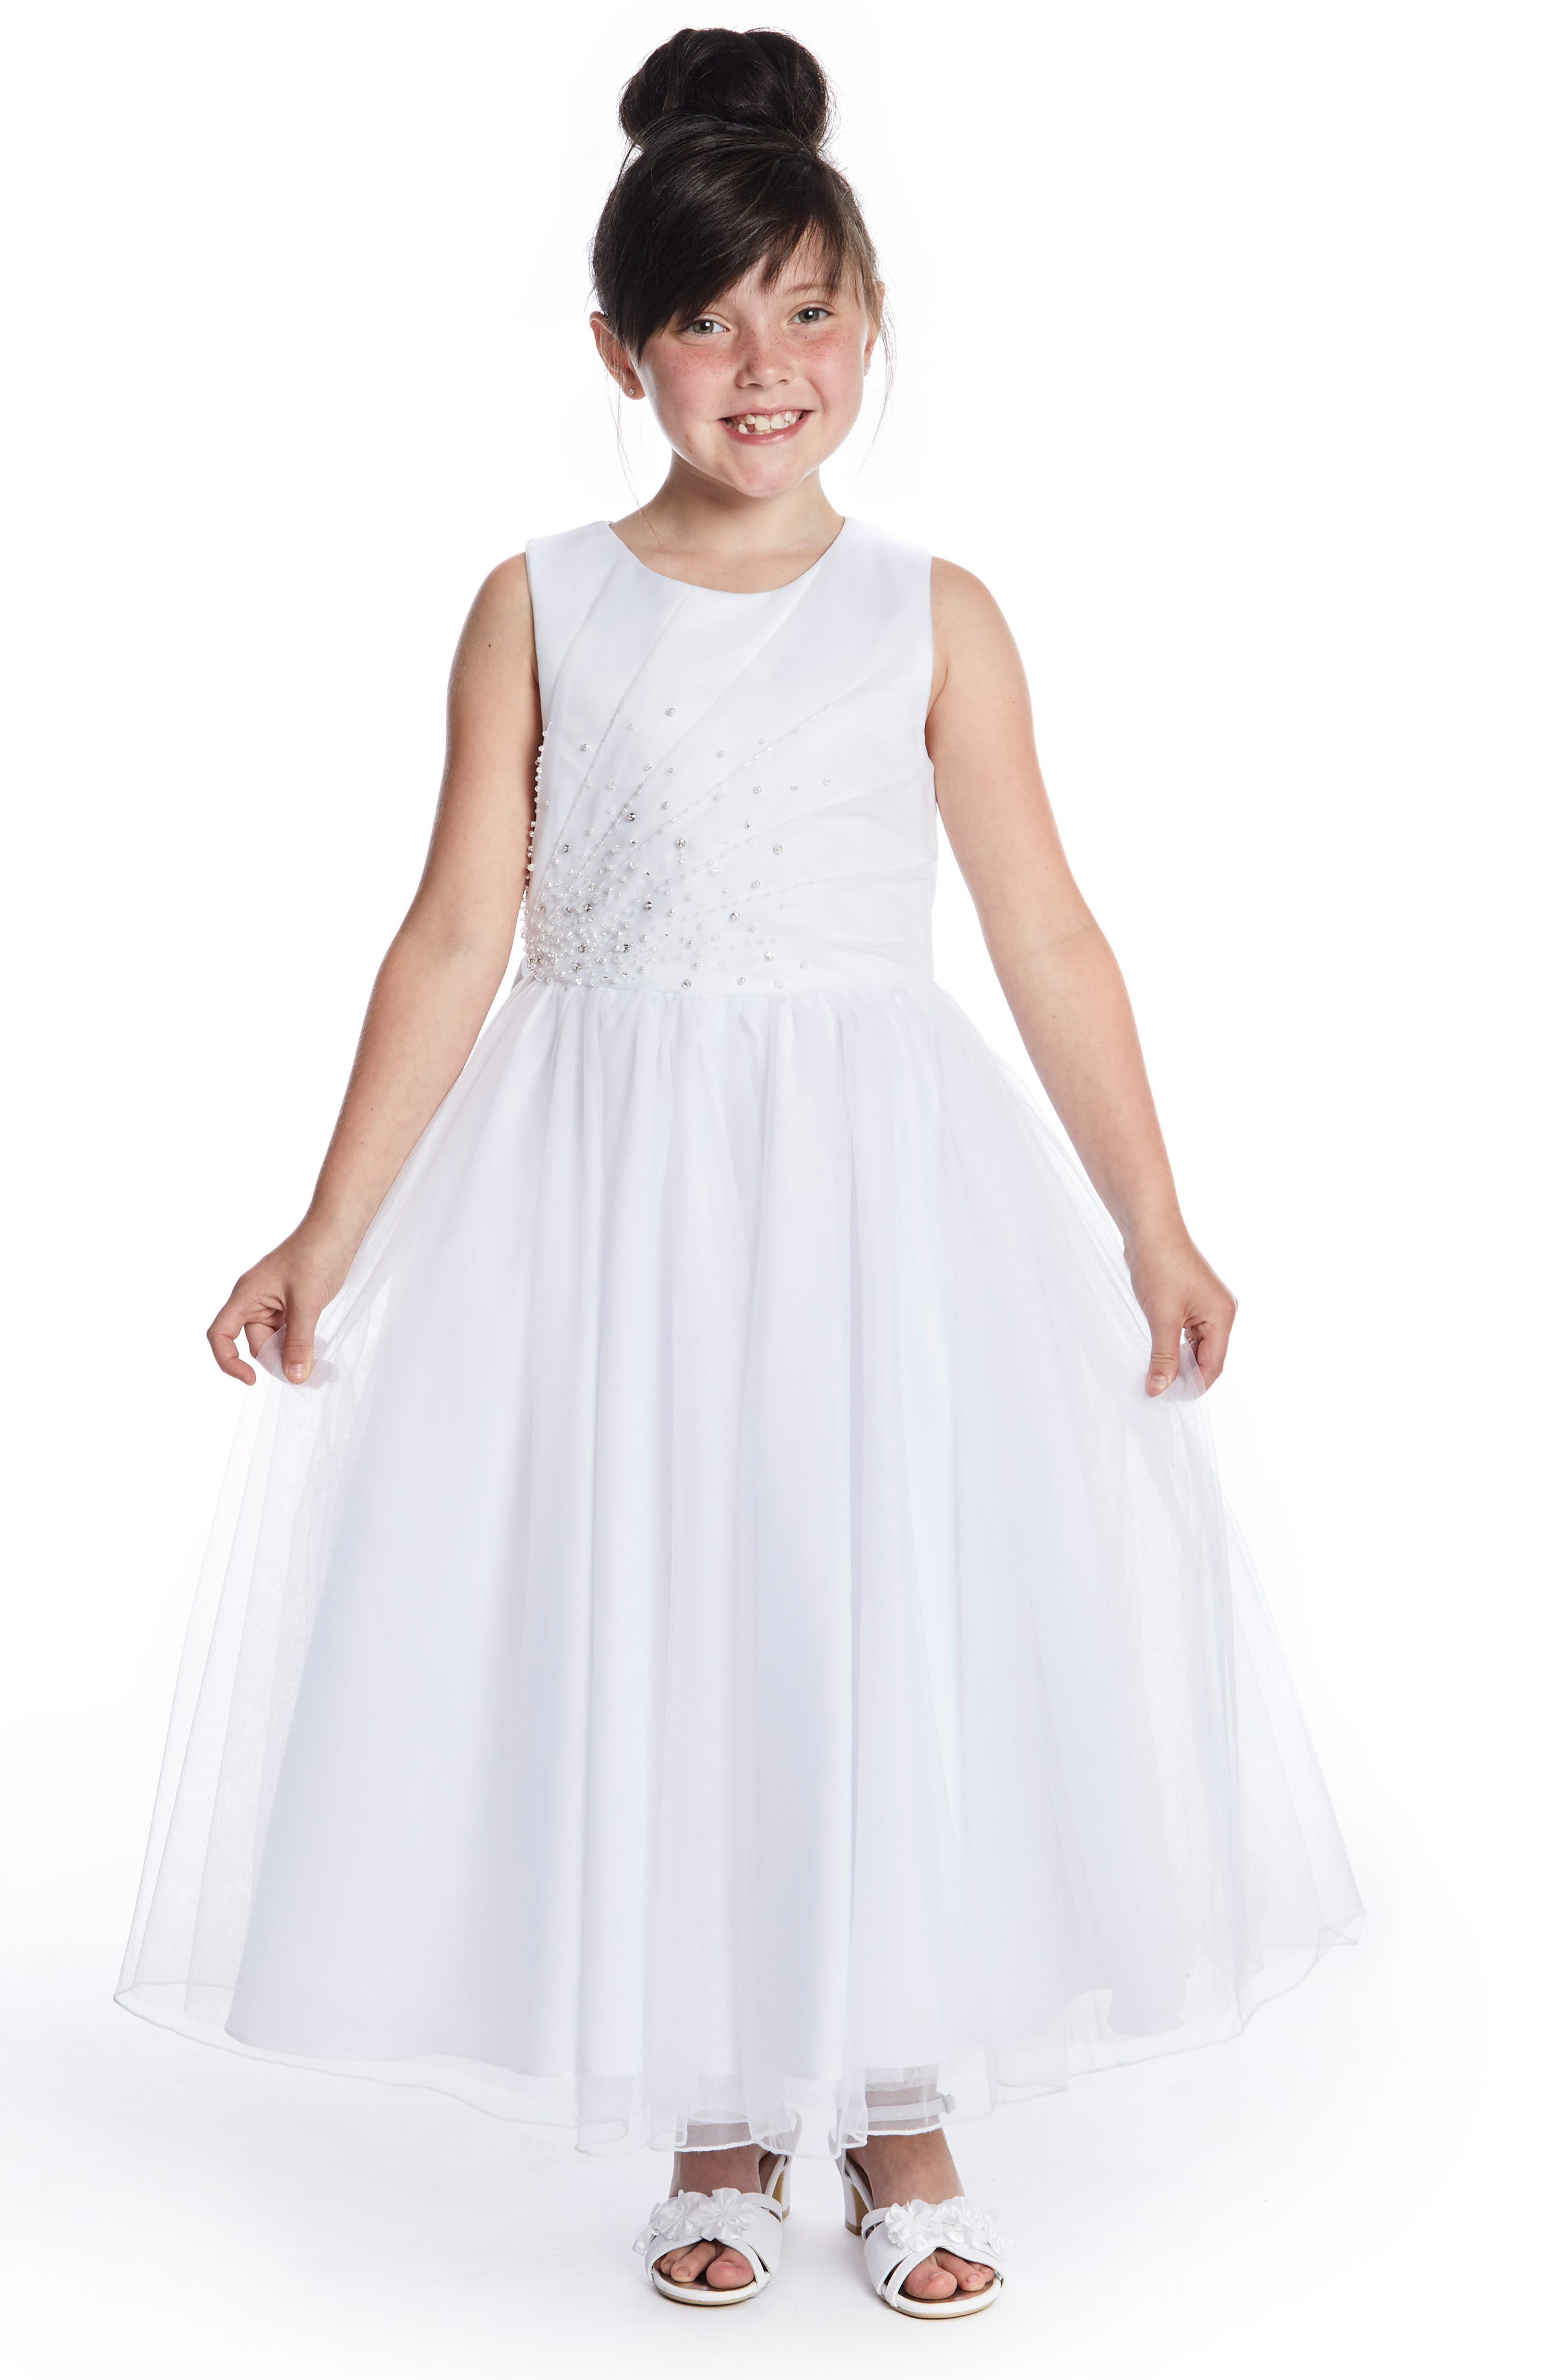 LAUREN MARIE Beaded First Communion Dress, Main, color, WHITE